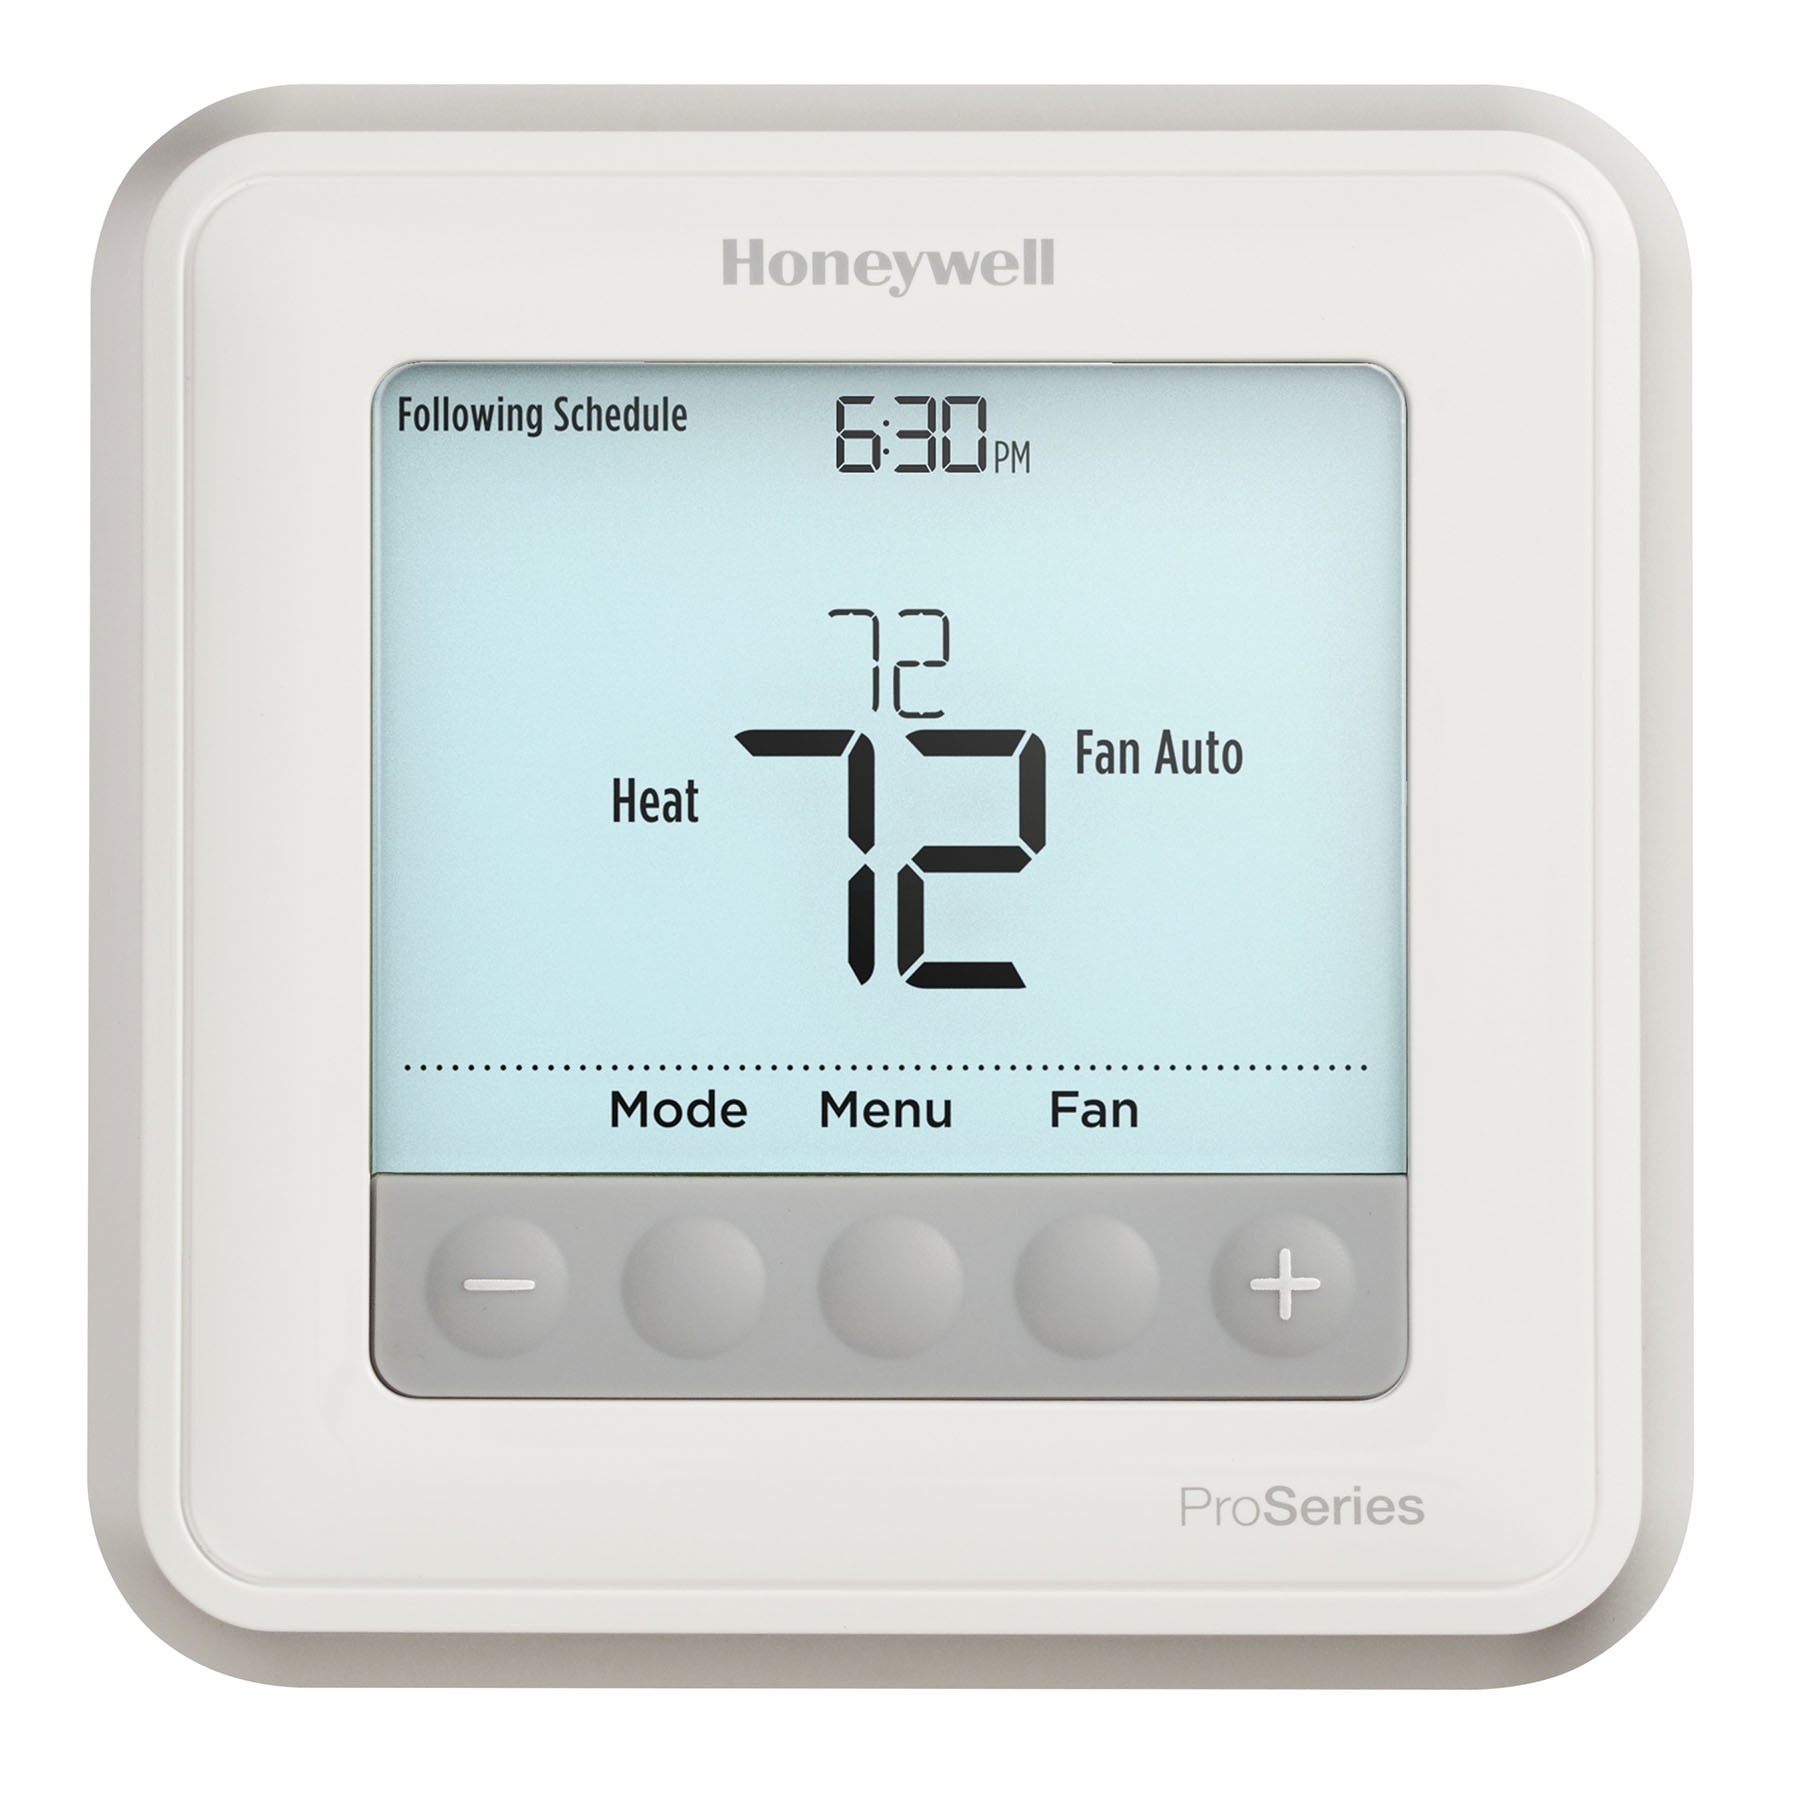 Honeywell Home Th6320wf2003 Lyric T6 Pro Wi-fi Programmable